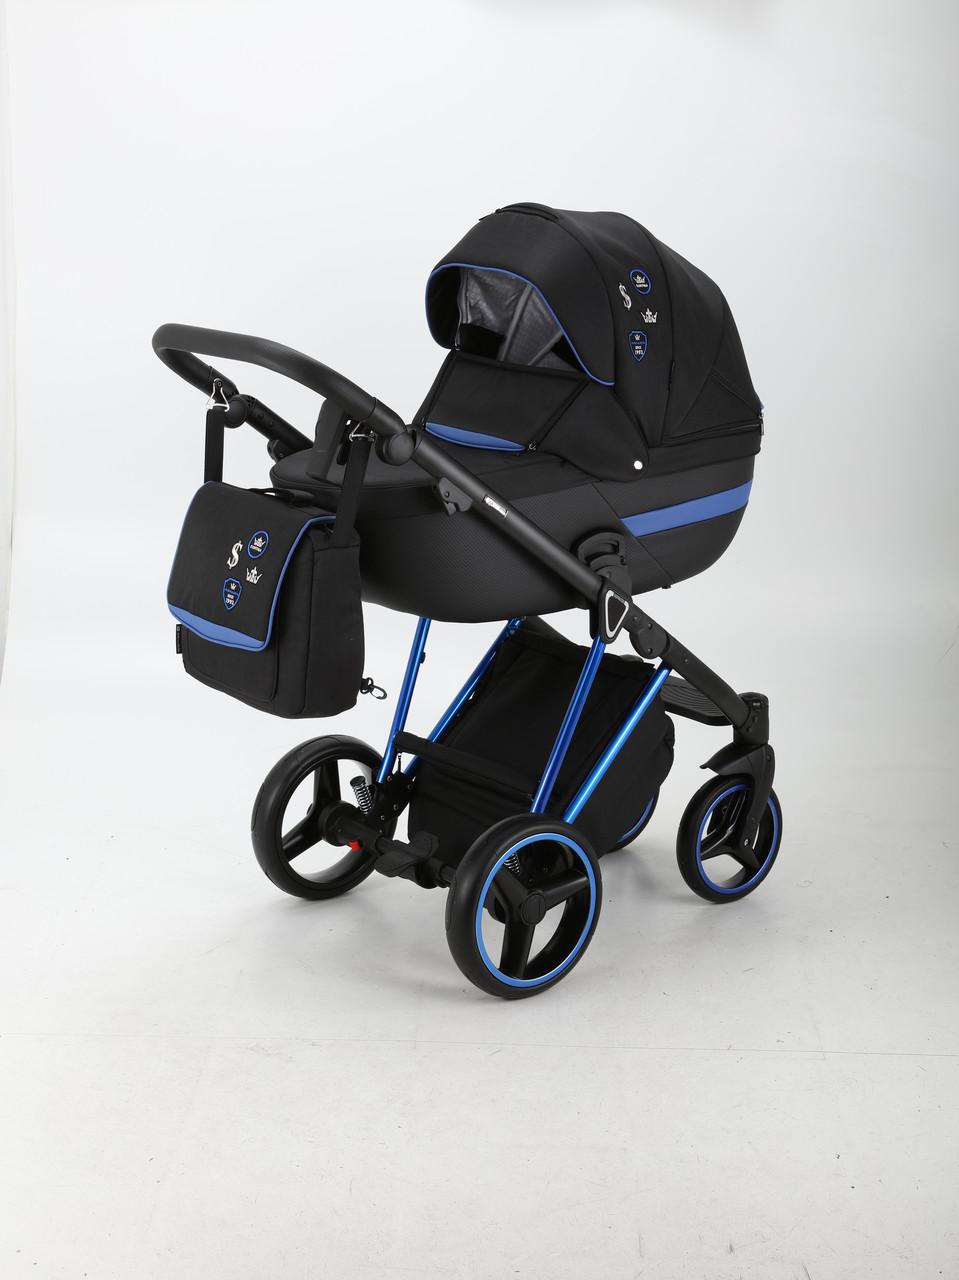 Коляска Adamex Cortina Sport CS-404 чорна (шасі blue) 2в1